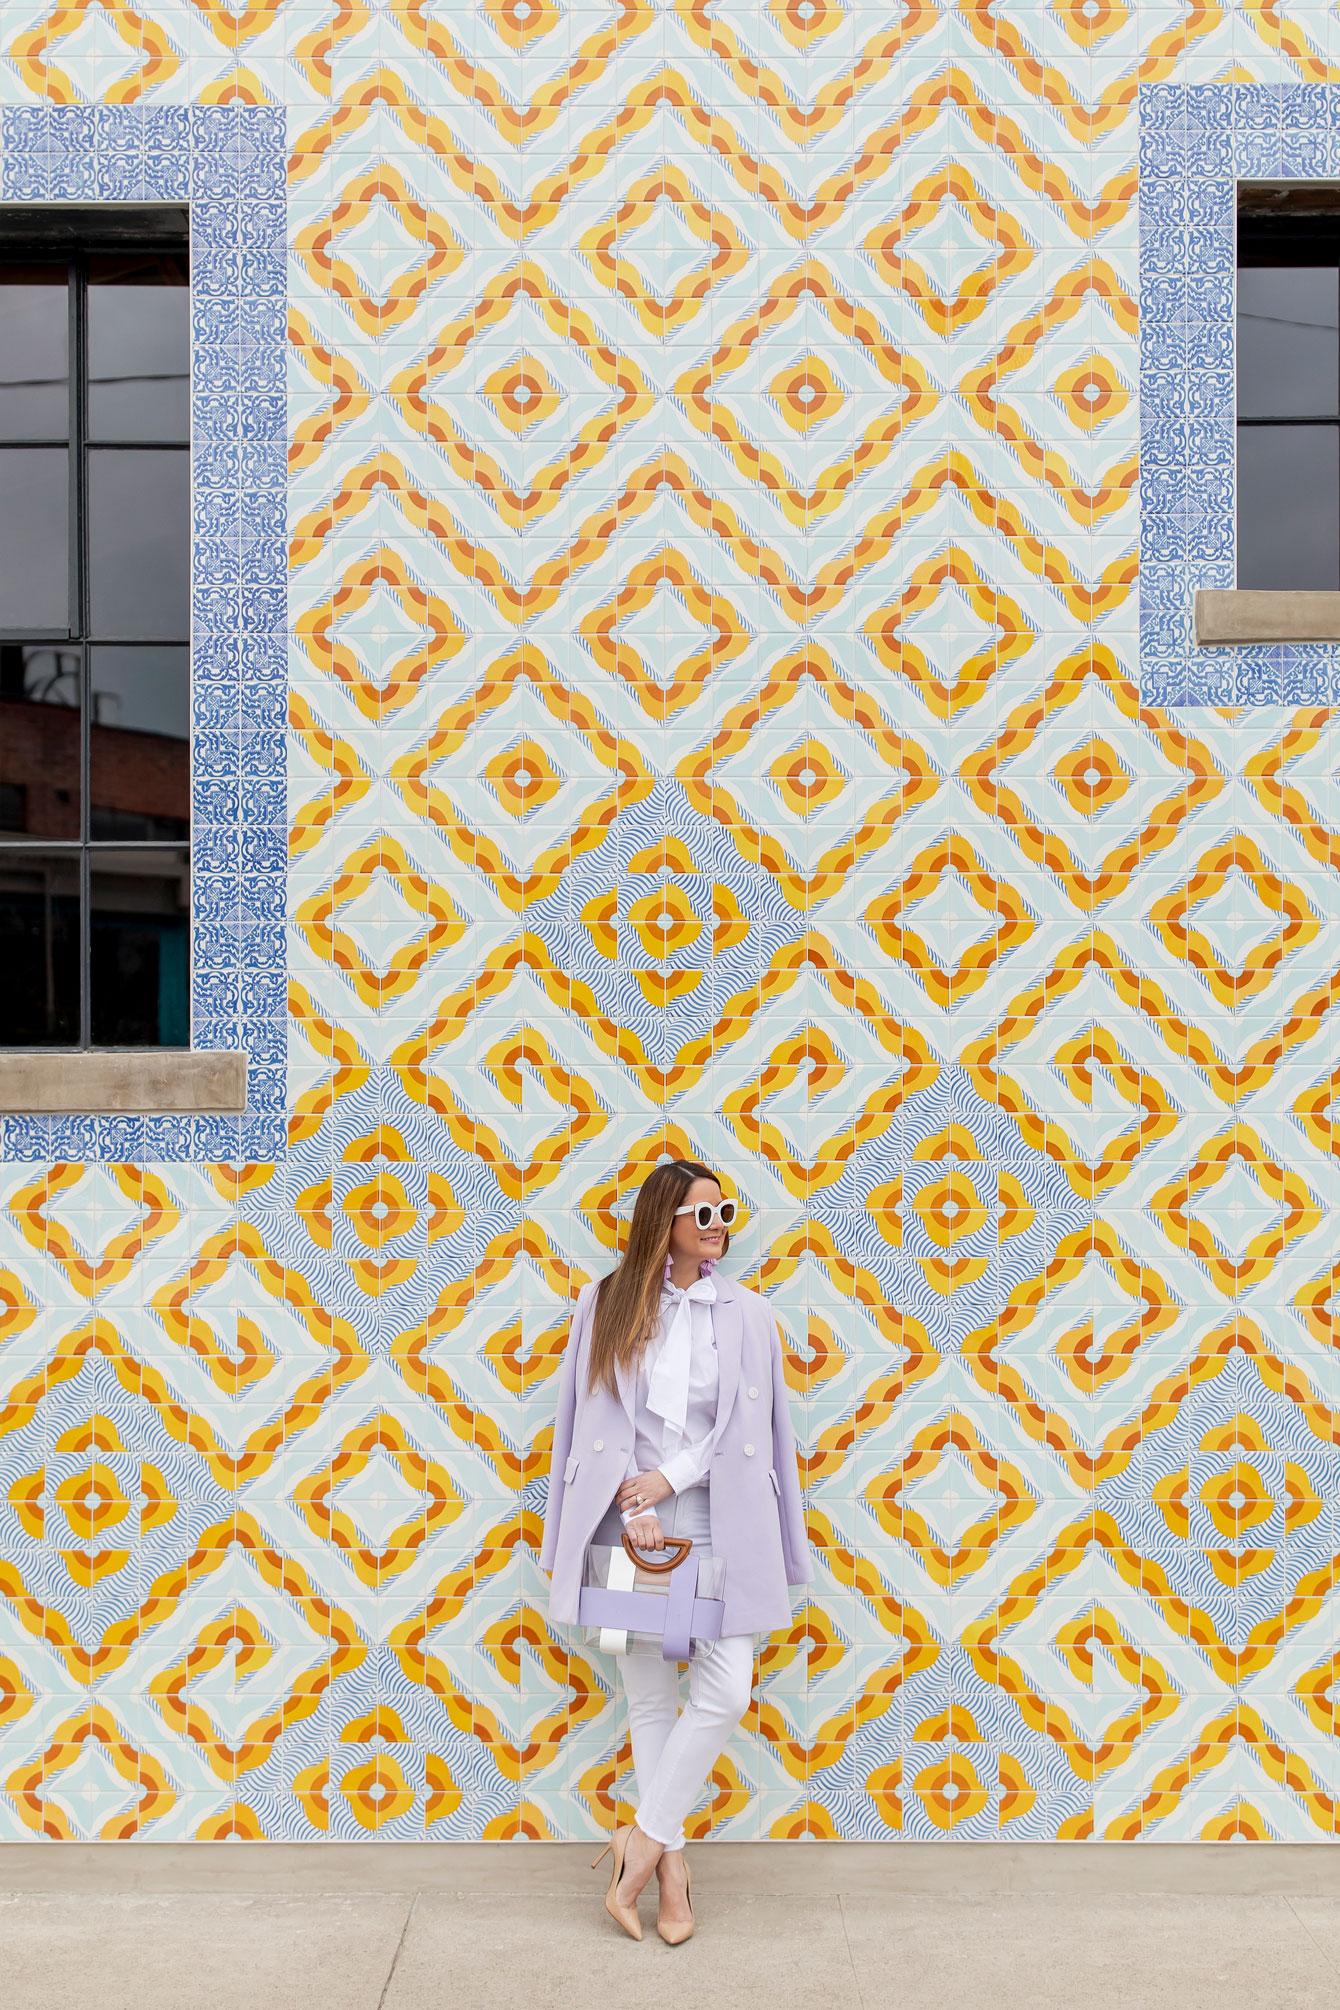 Downtown Los Angeles Colorful Tile Building